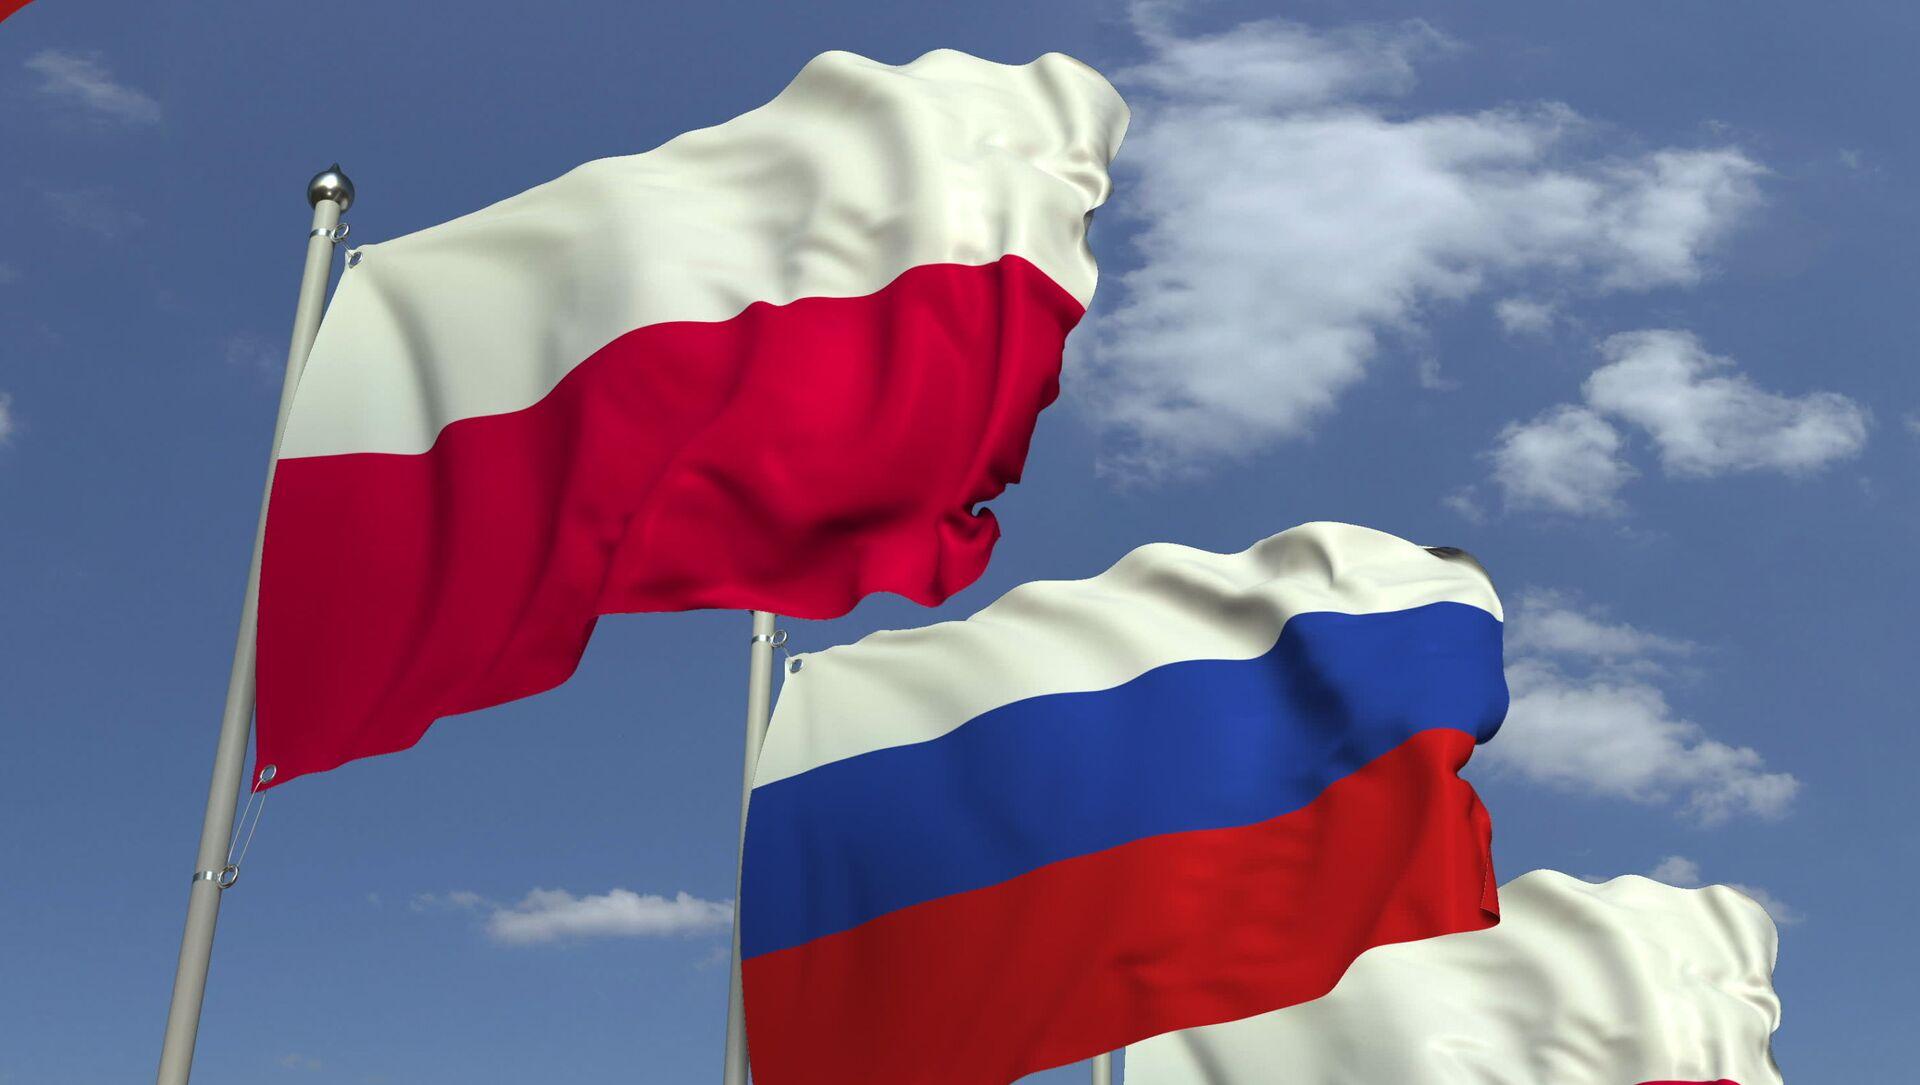 Flagi Rosji i Polski - Sputnik Polska, 1920, 24.03.2021